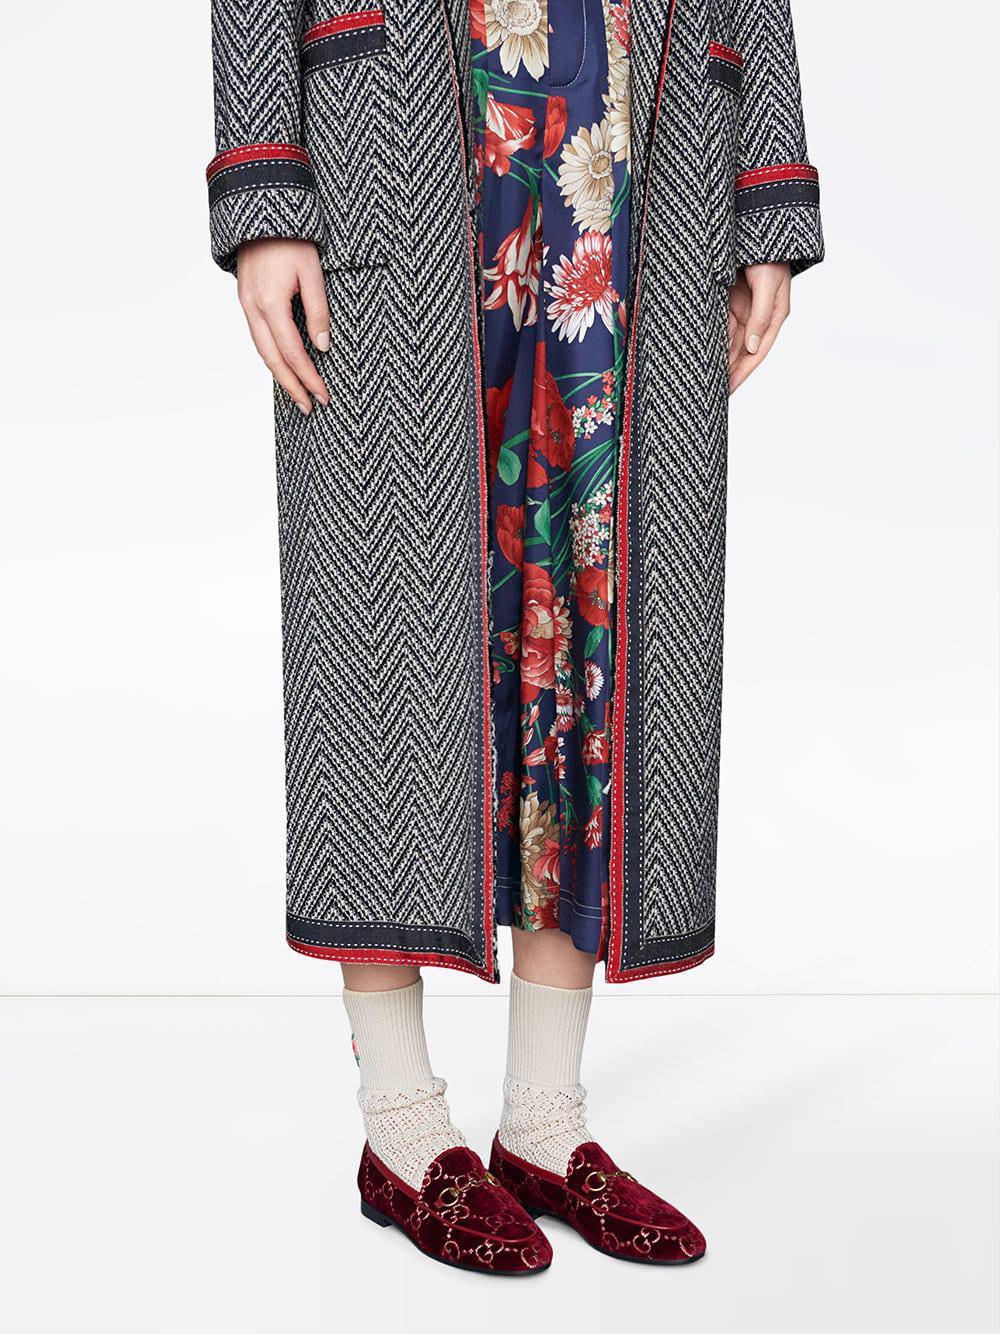 cf519ddaecf Lyst - Gucci Jordaan Logo Jacquard Velvet Loafers in Red - Save 9%